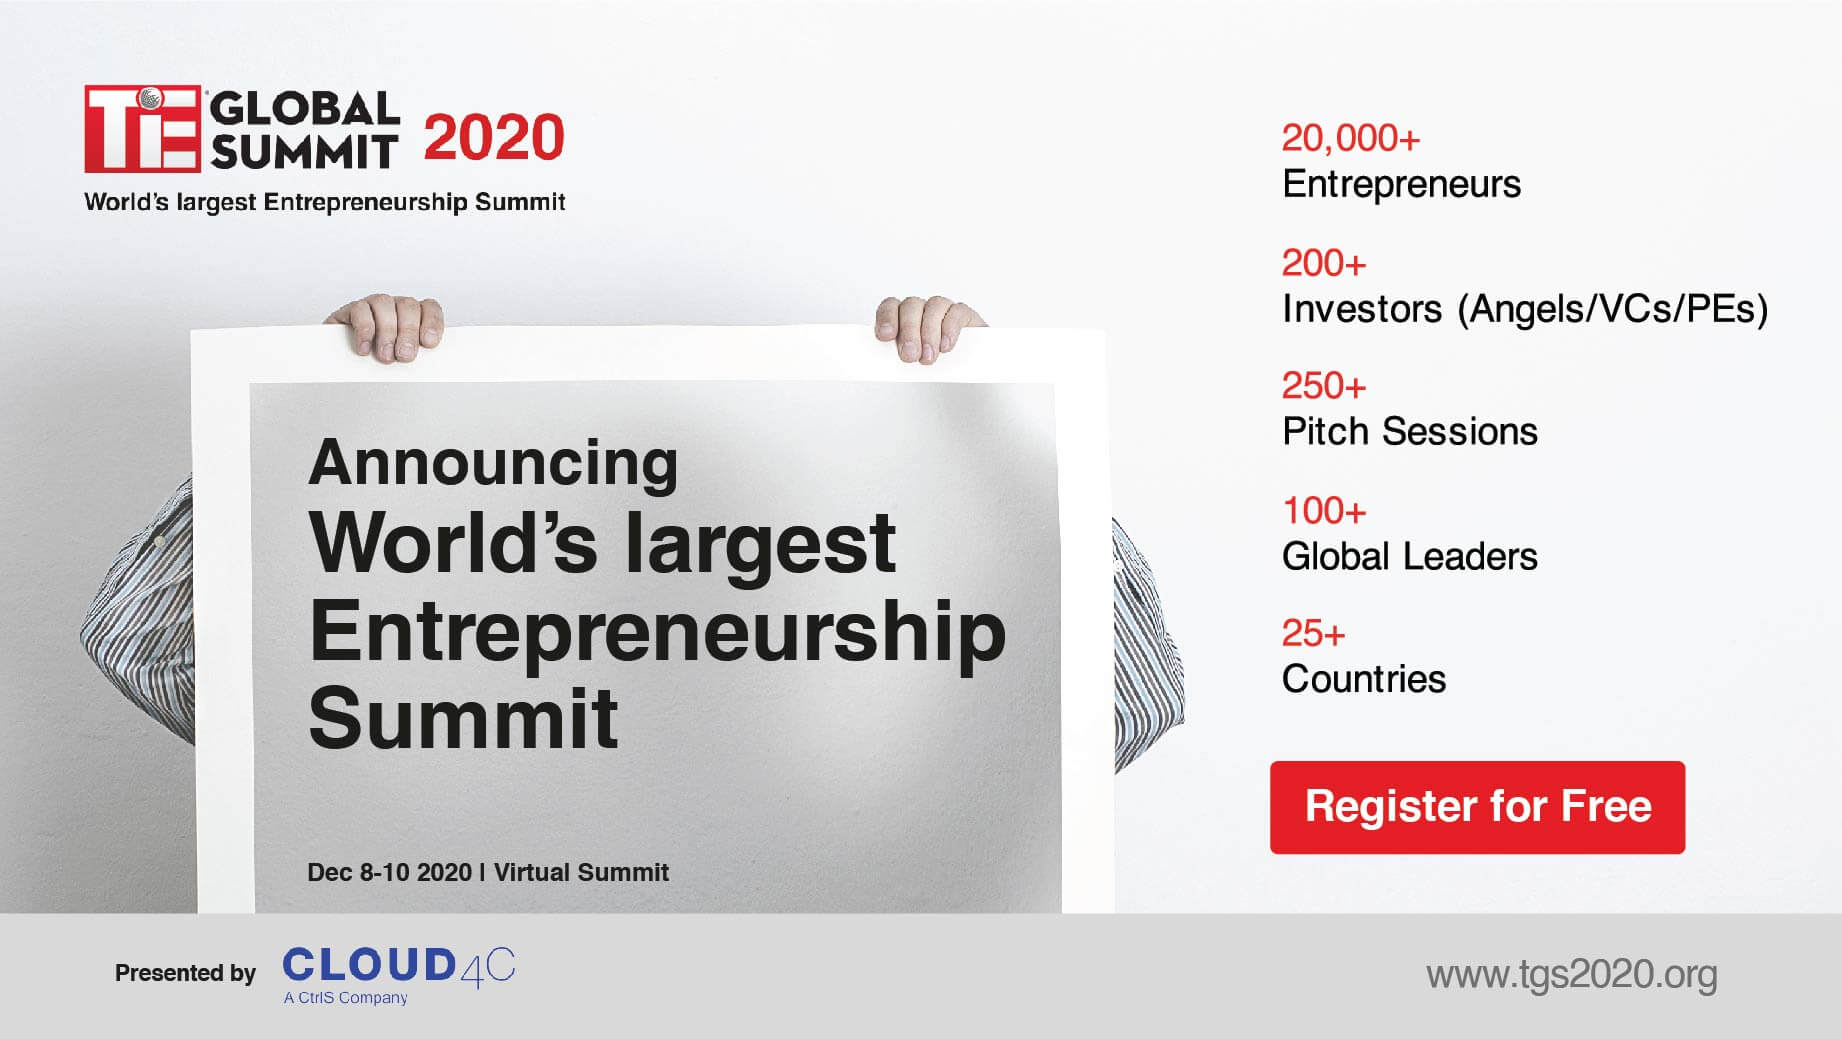 Tie Entrepreneurship Event 2020